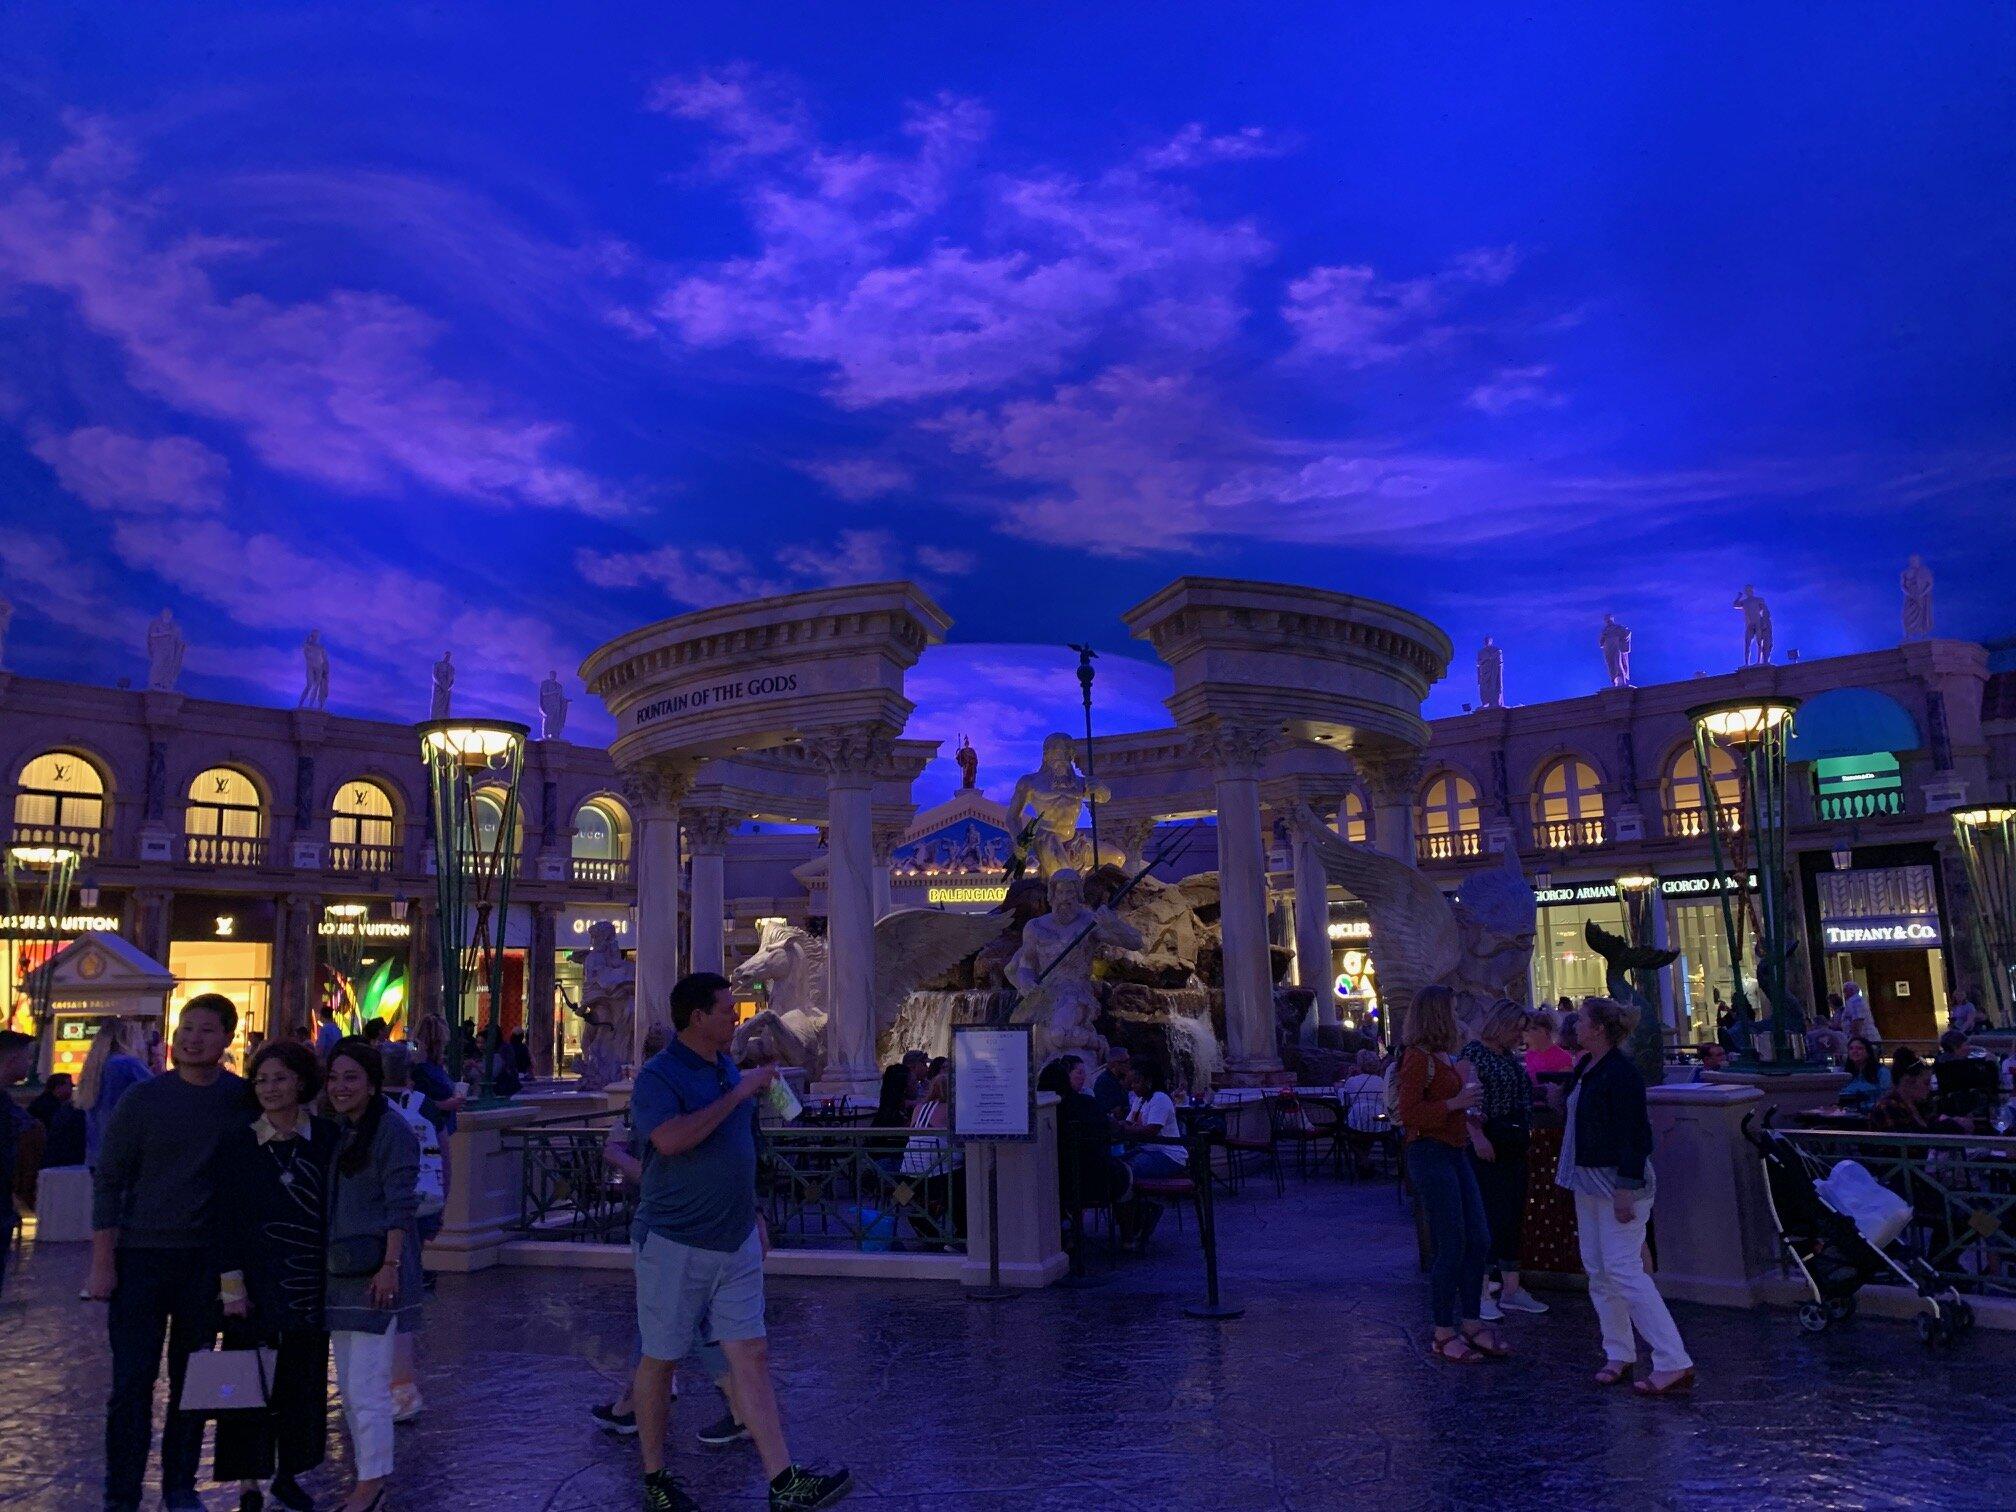 I just love the fake sky inside La Piazza at the Venetian. So faux, so fun. Image Courtesy: Dan Meyers